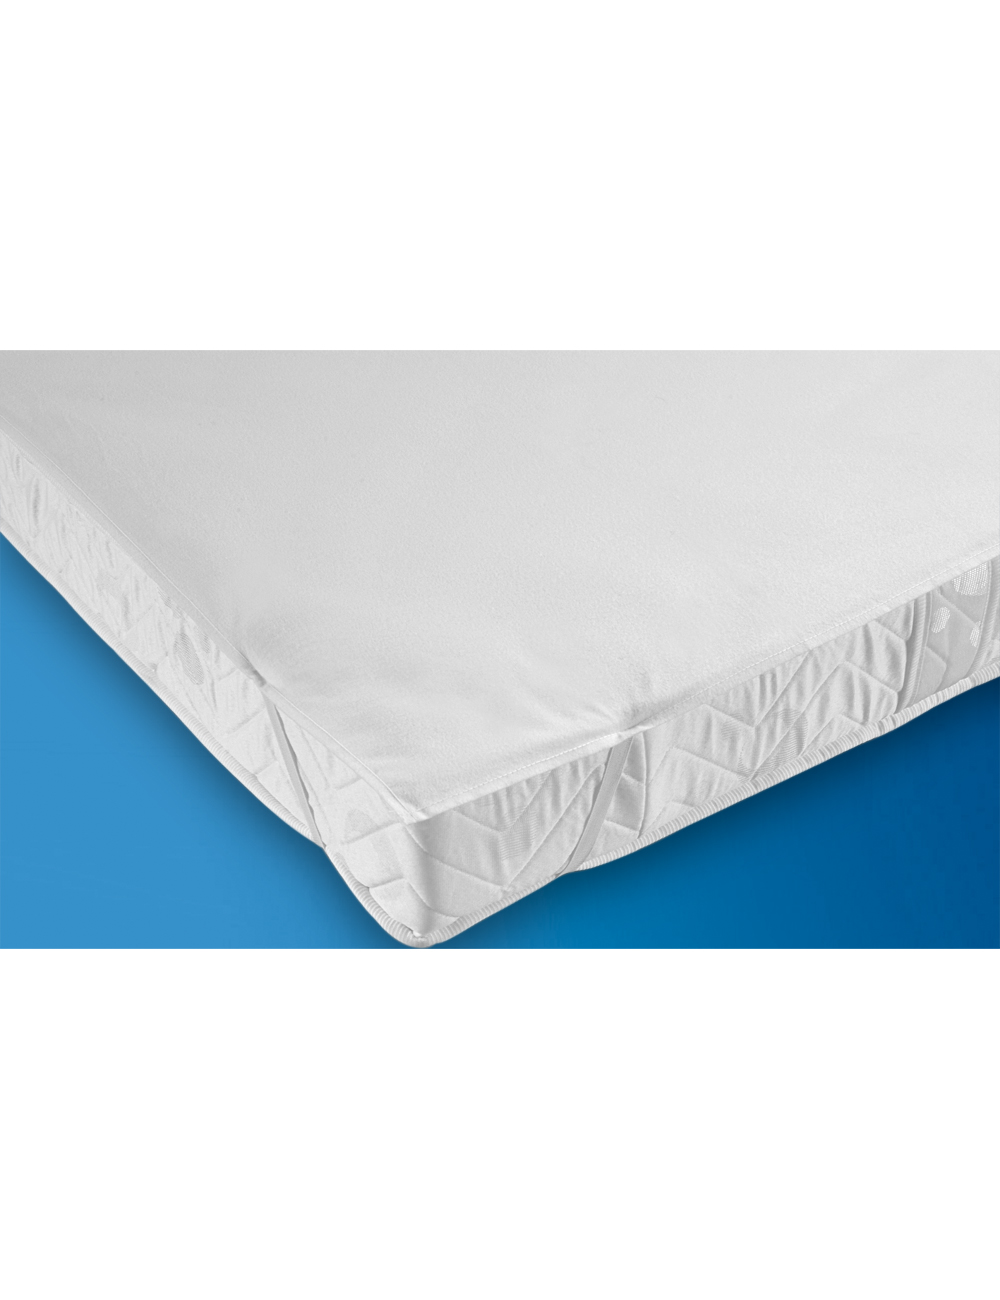 prot ge matelas colo 140 x 200 cm. Black Bedroom Furniture Sets. Home Design Ideas